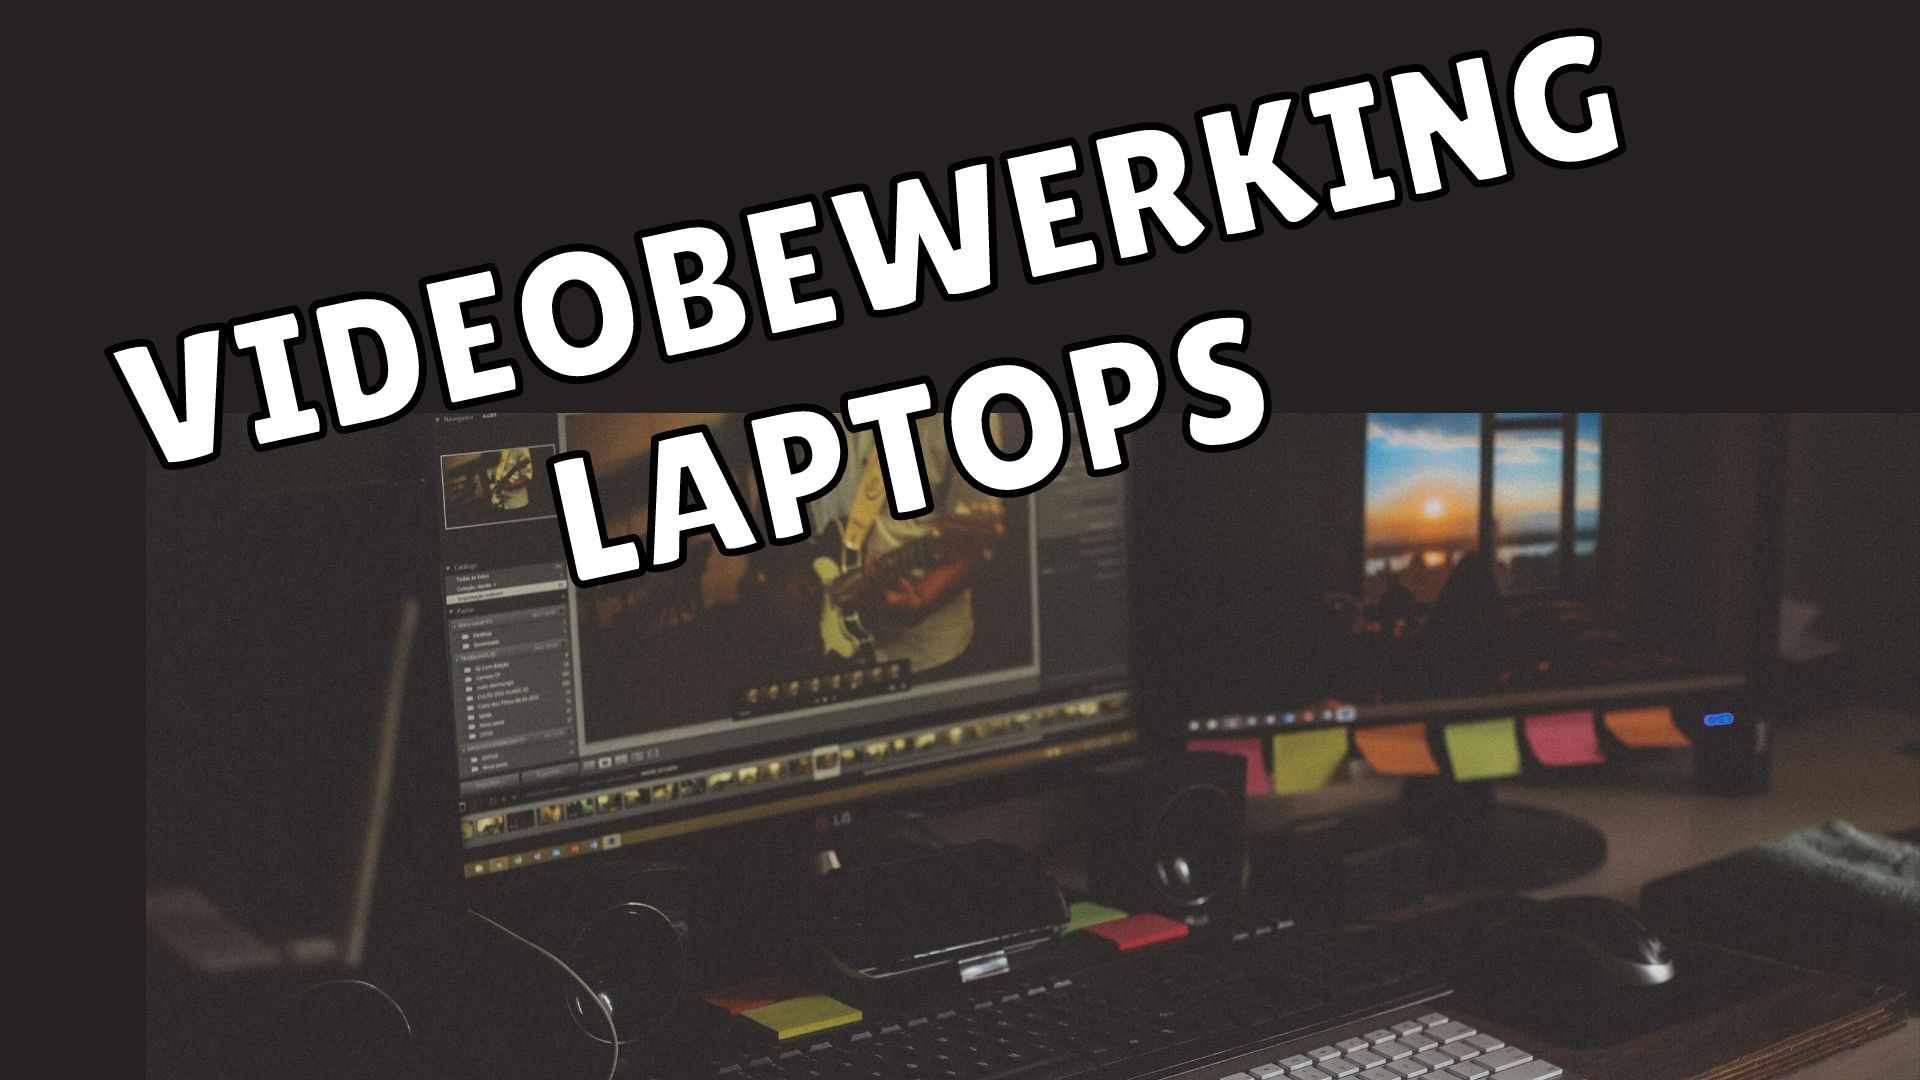 Beste videobewerking laptops